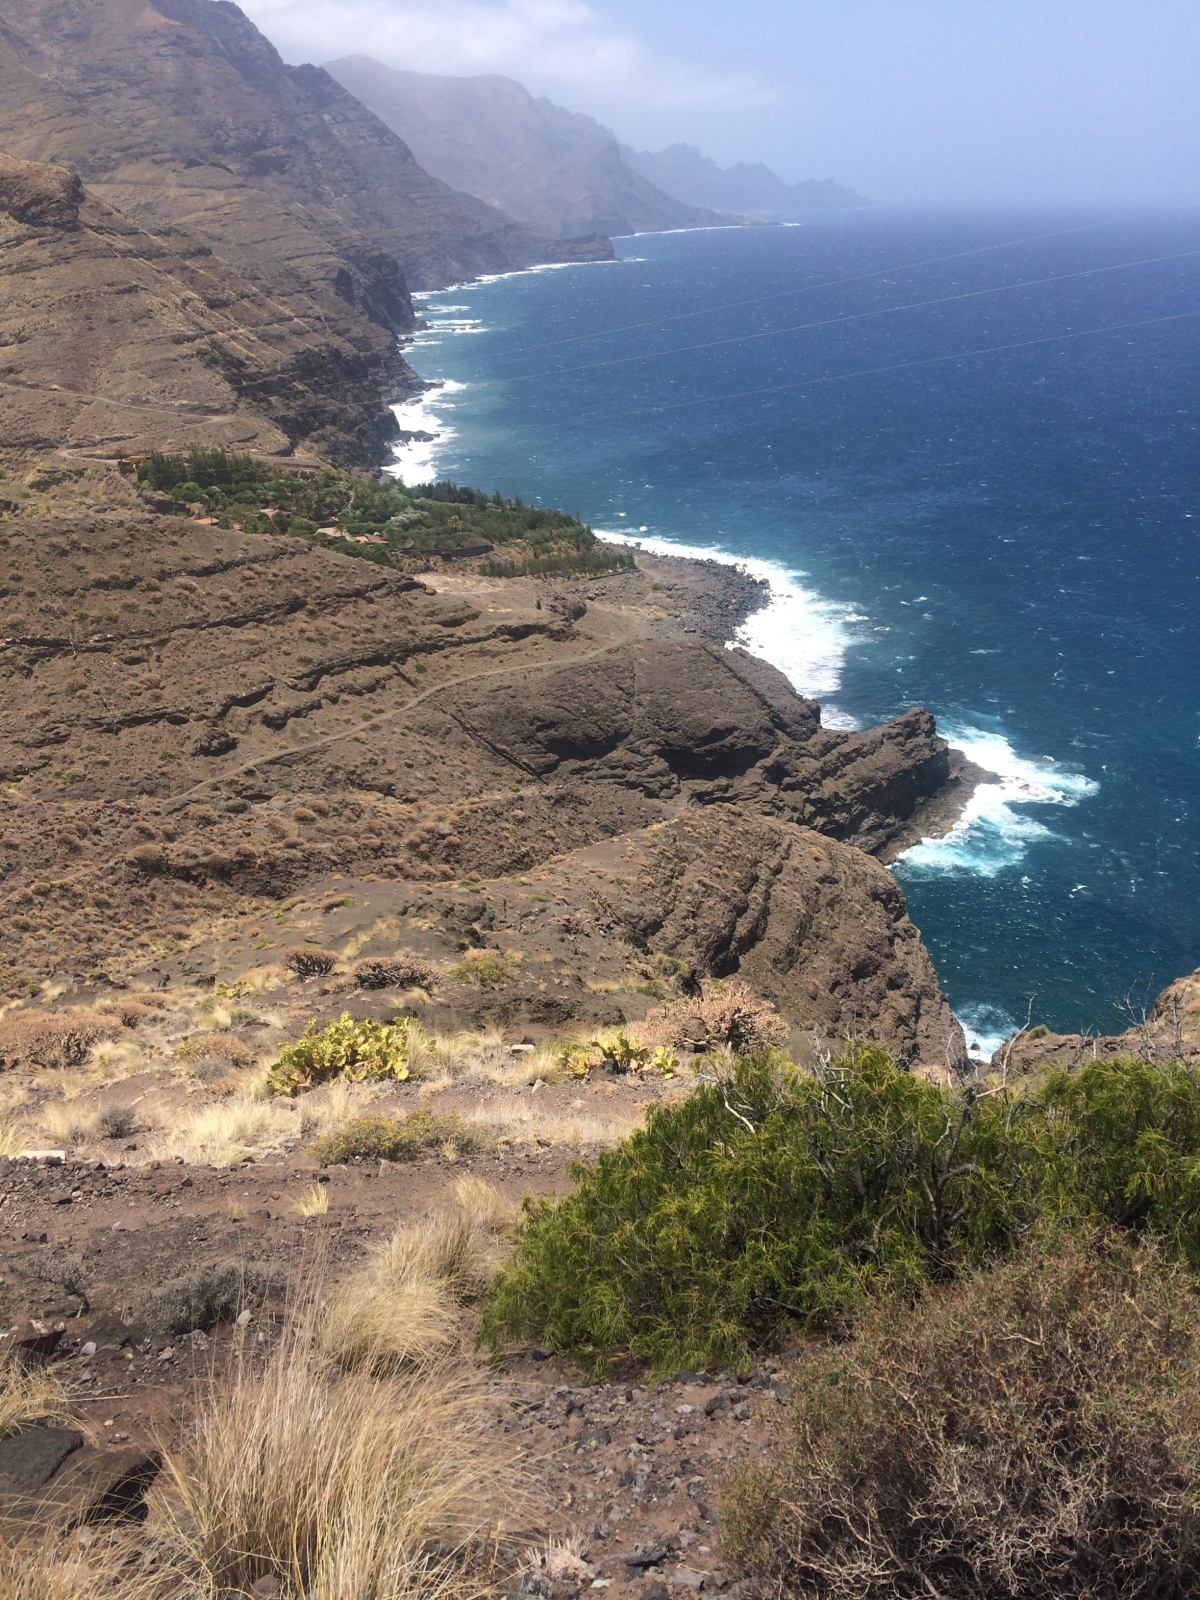 Wild & beautiful Agaete: a hidden gem in the CanaryIslands